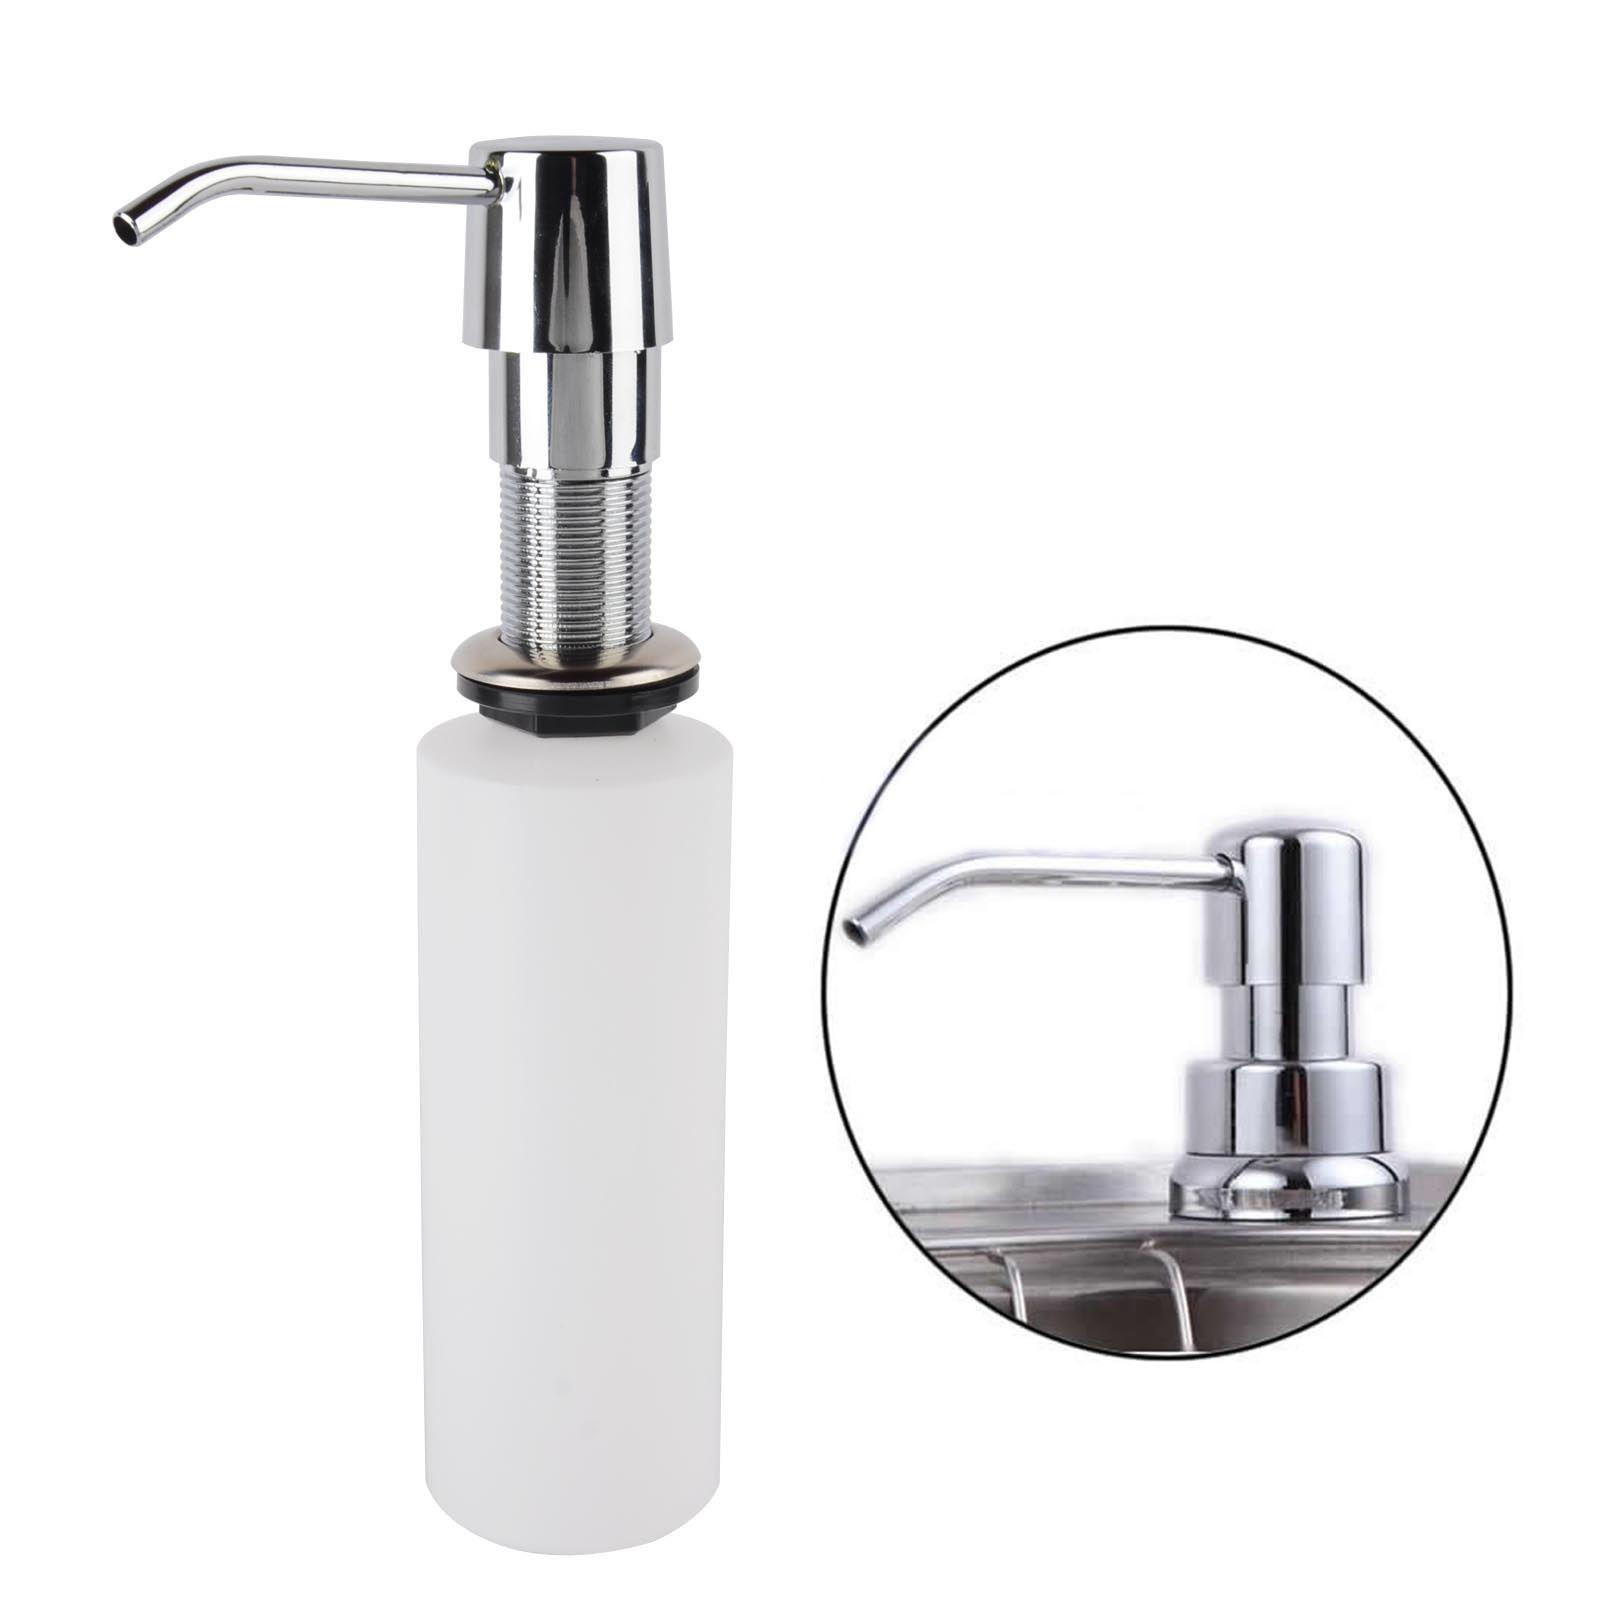 kitchen liquid dispenser islands carts 2019 250ml plastic 43stainless steel 300ml bathroom